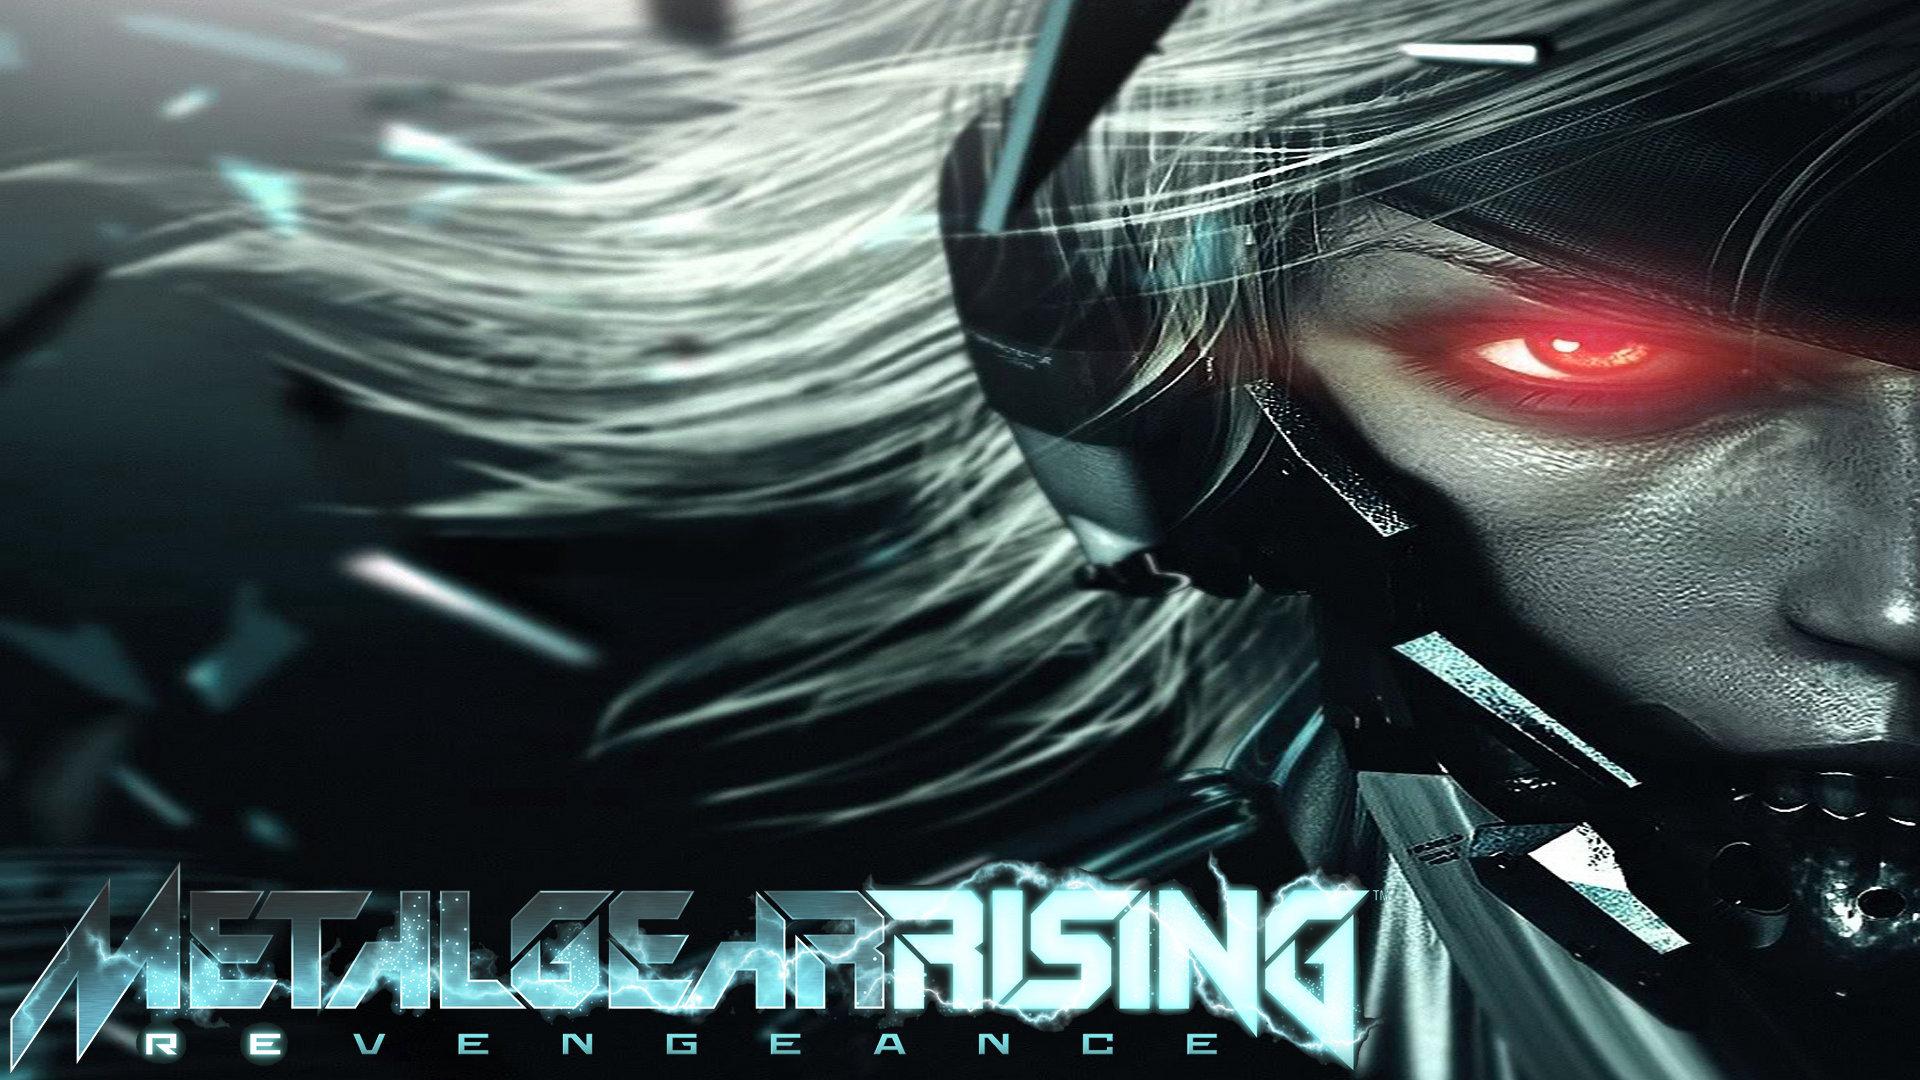 metal-gear-rising-revengeance-background